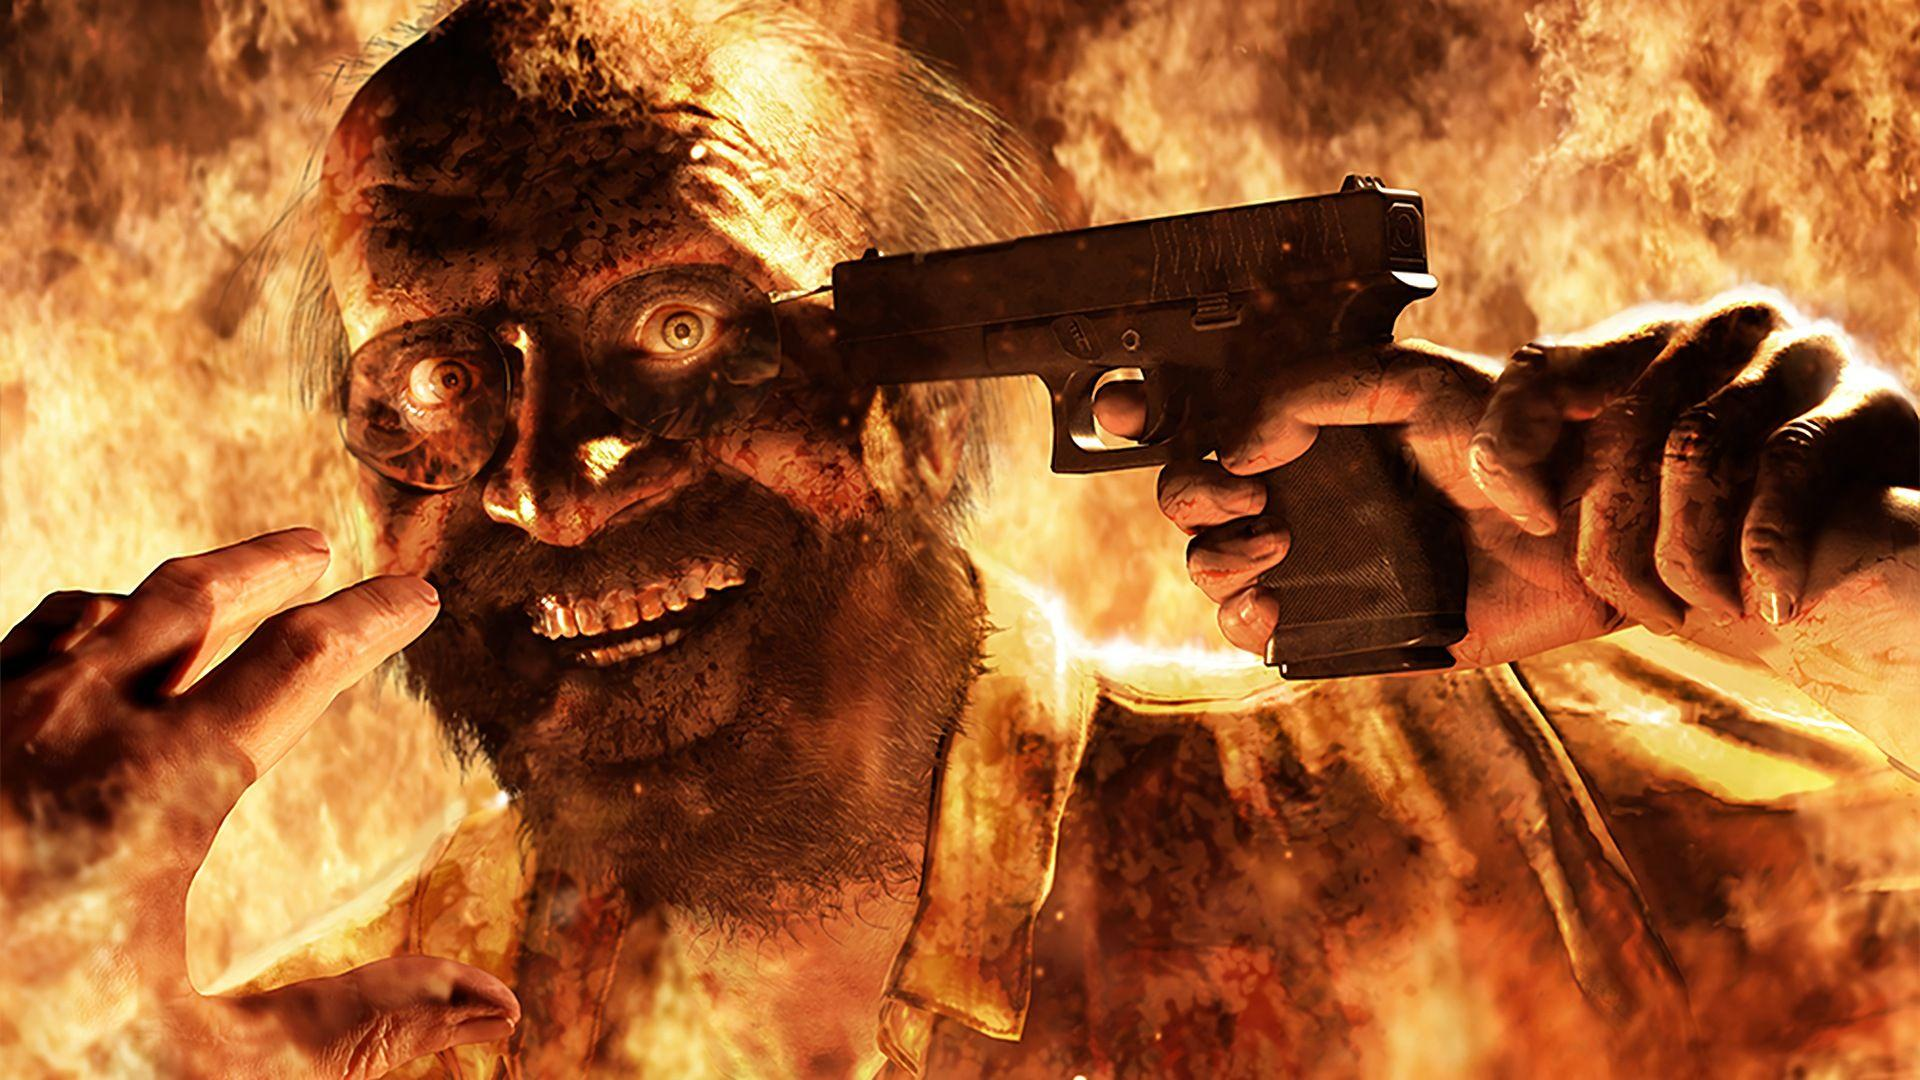 Resident Evil 7 Biohazard Wallpapers Wallpaper Cave